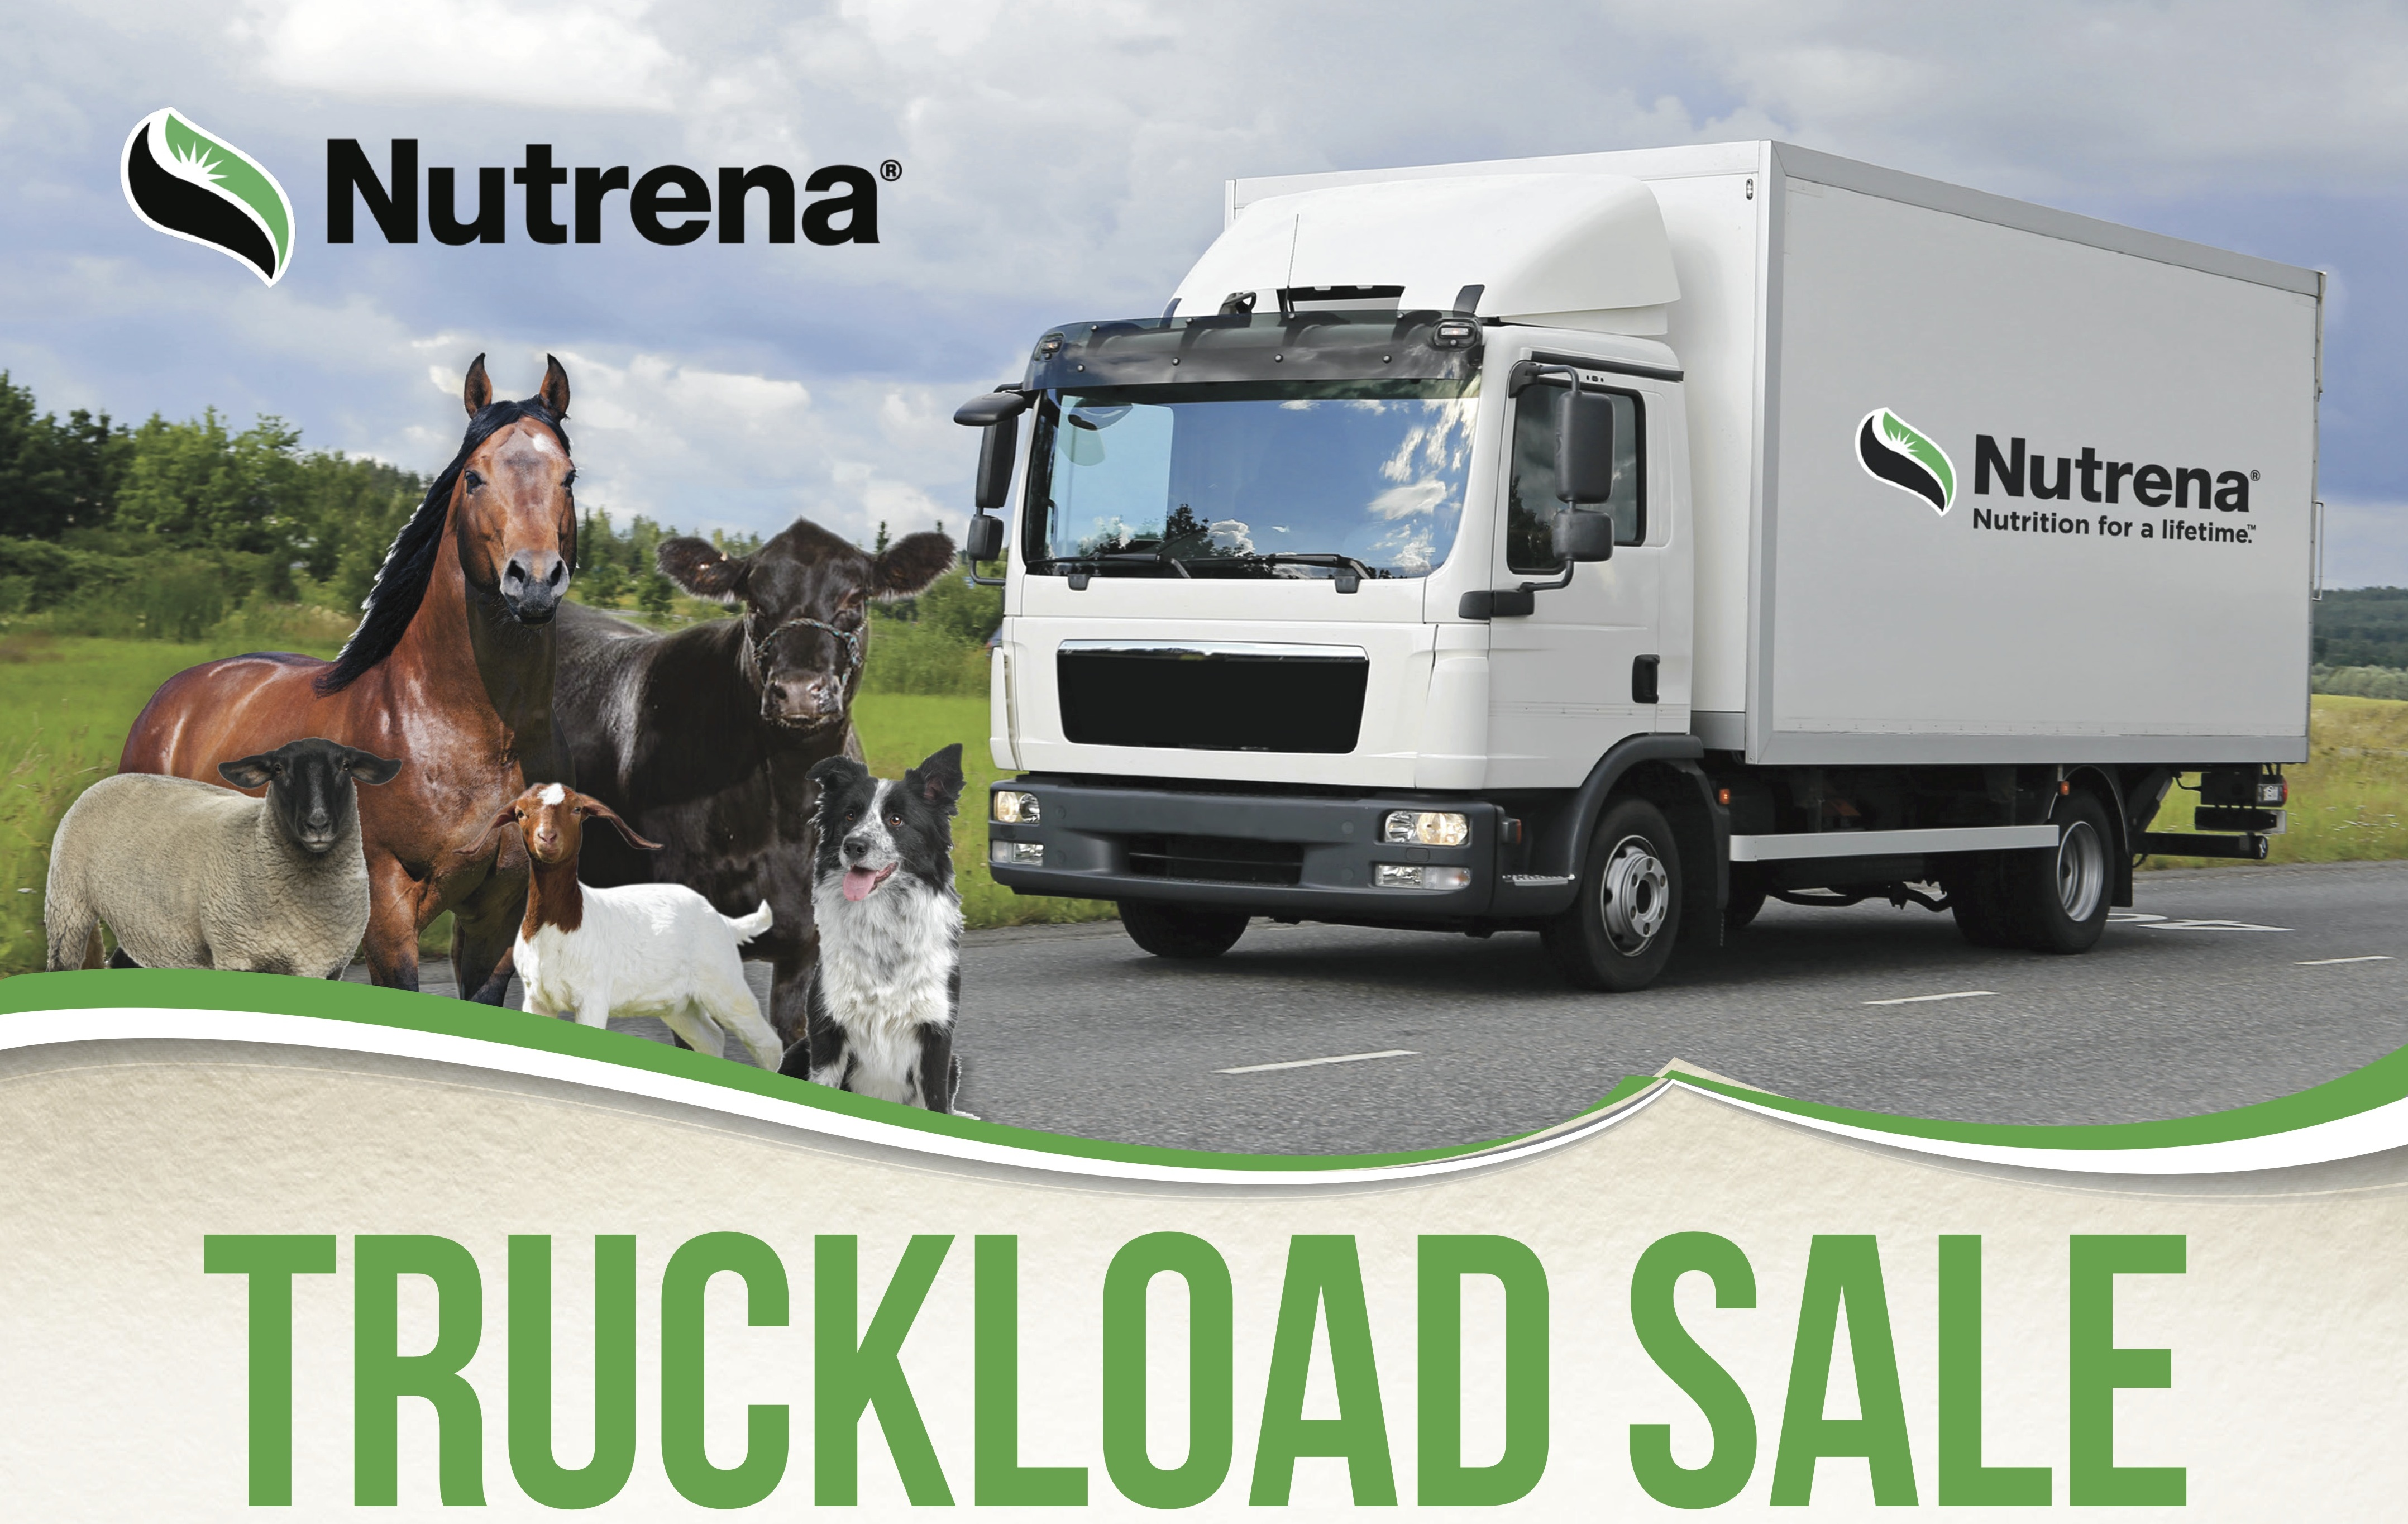 Nutrena Truckload Sale